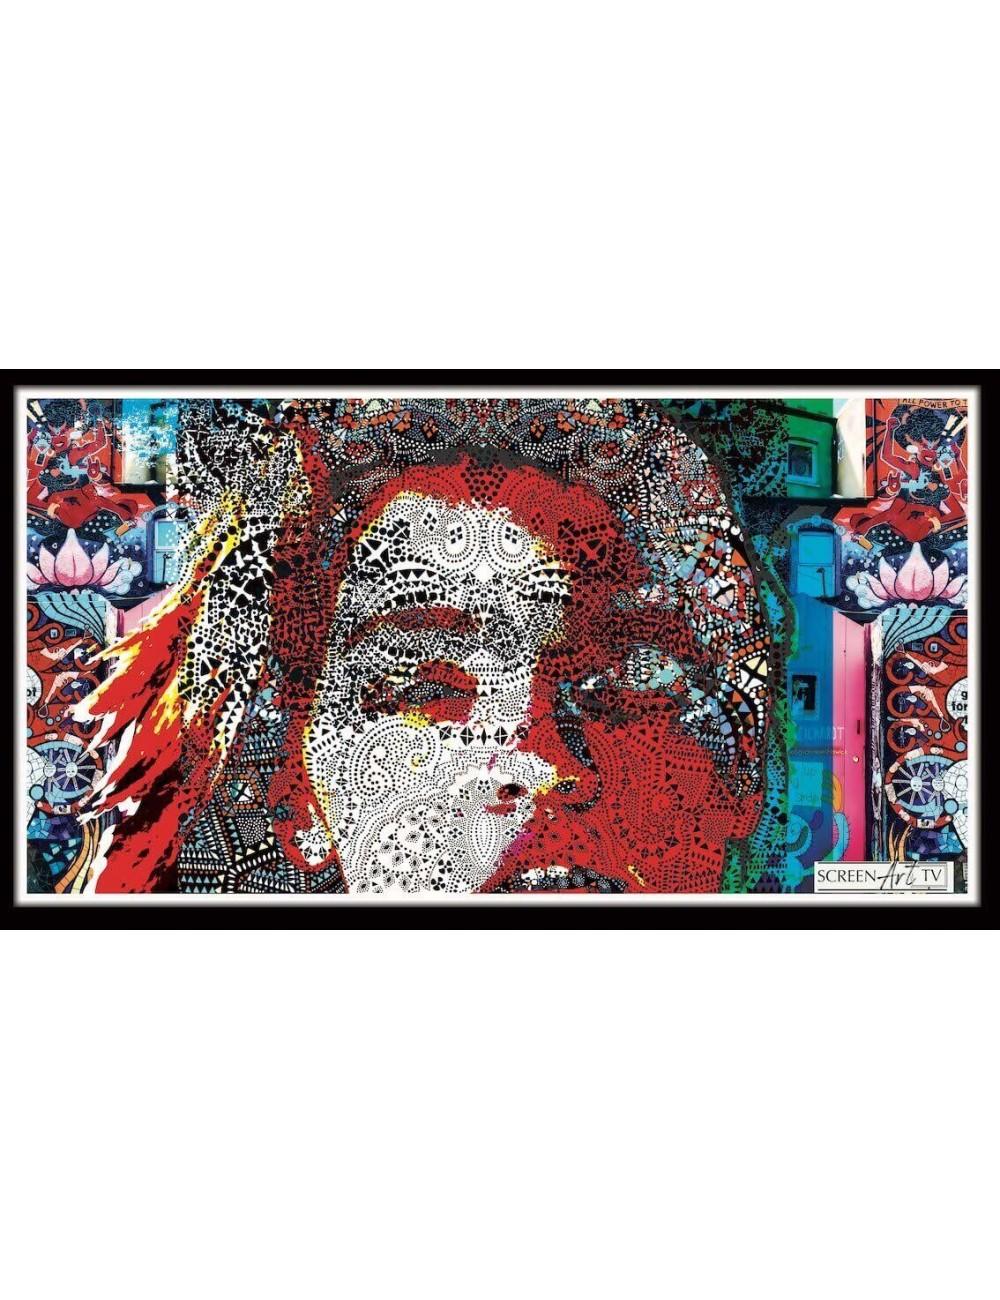 190 1-PORTRAIT FEMME MOUCHARABIEH MODERNE